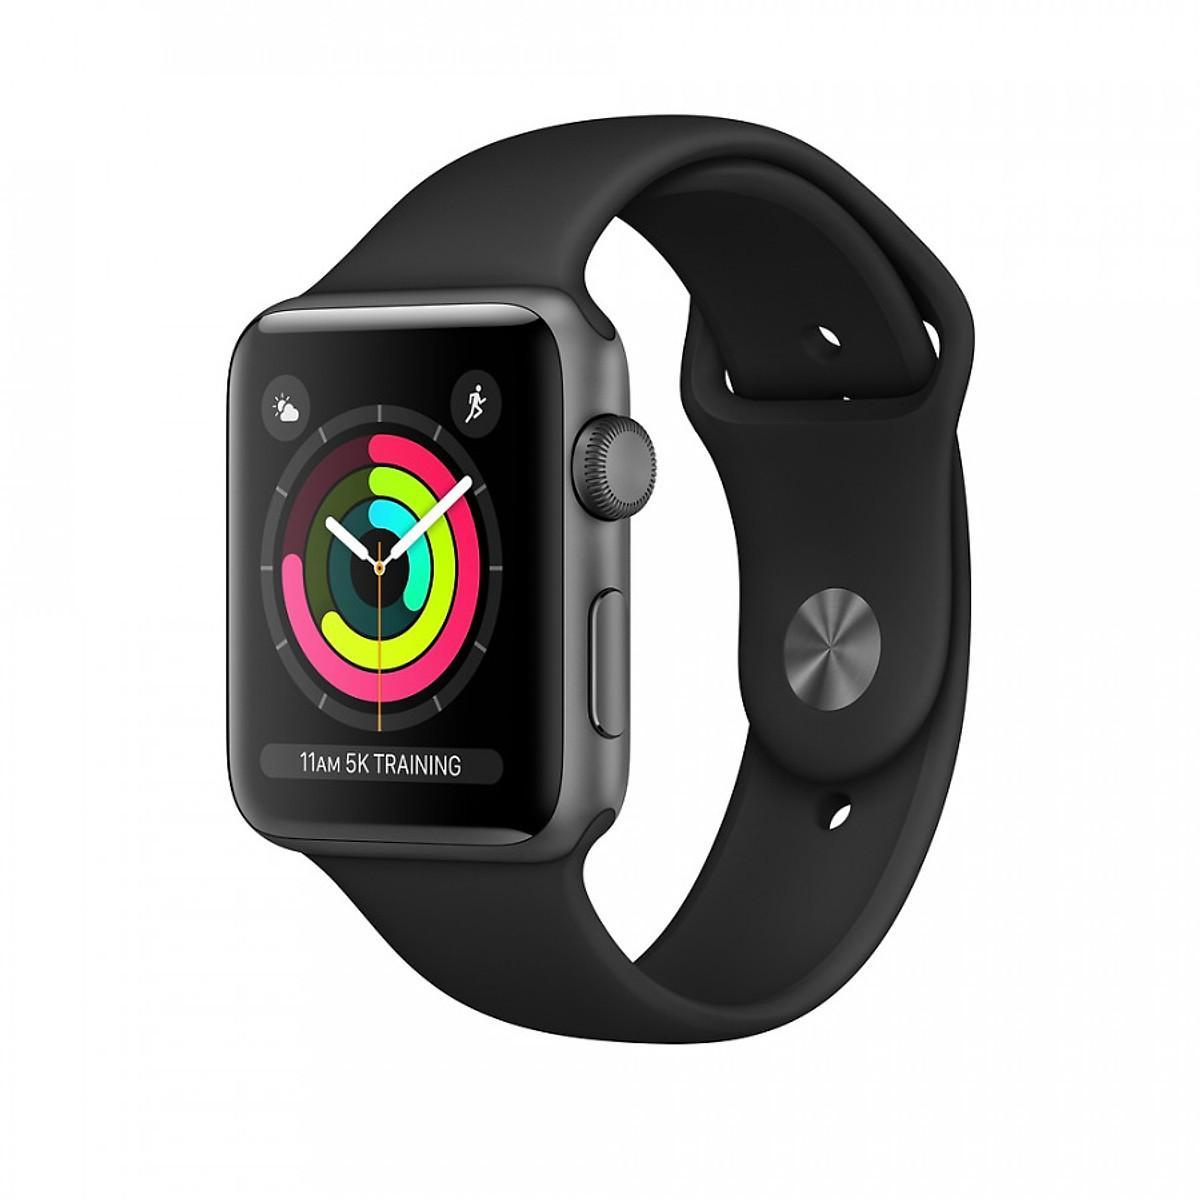 Đồng Hồ Thông Minh Apple Watch Series 3 GPS Aluminum Case With Sport Band - Nhập Khẩu